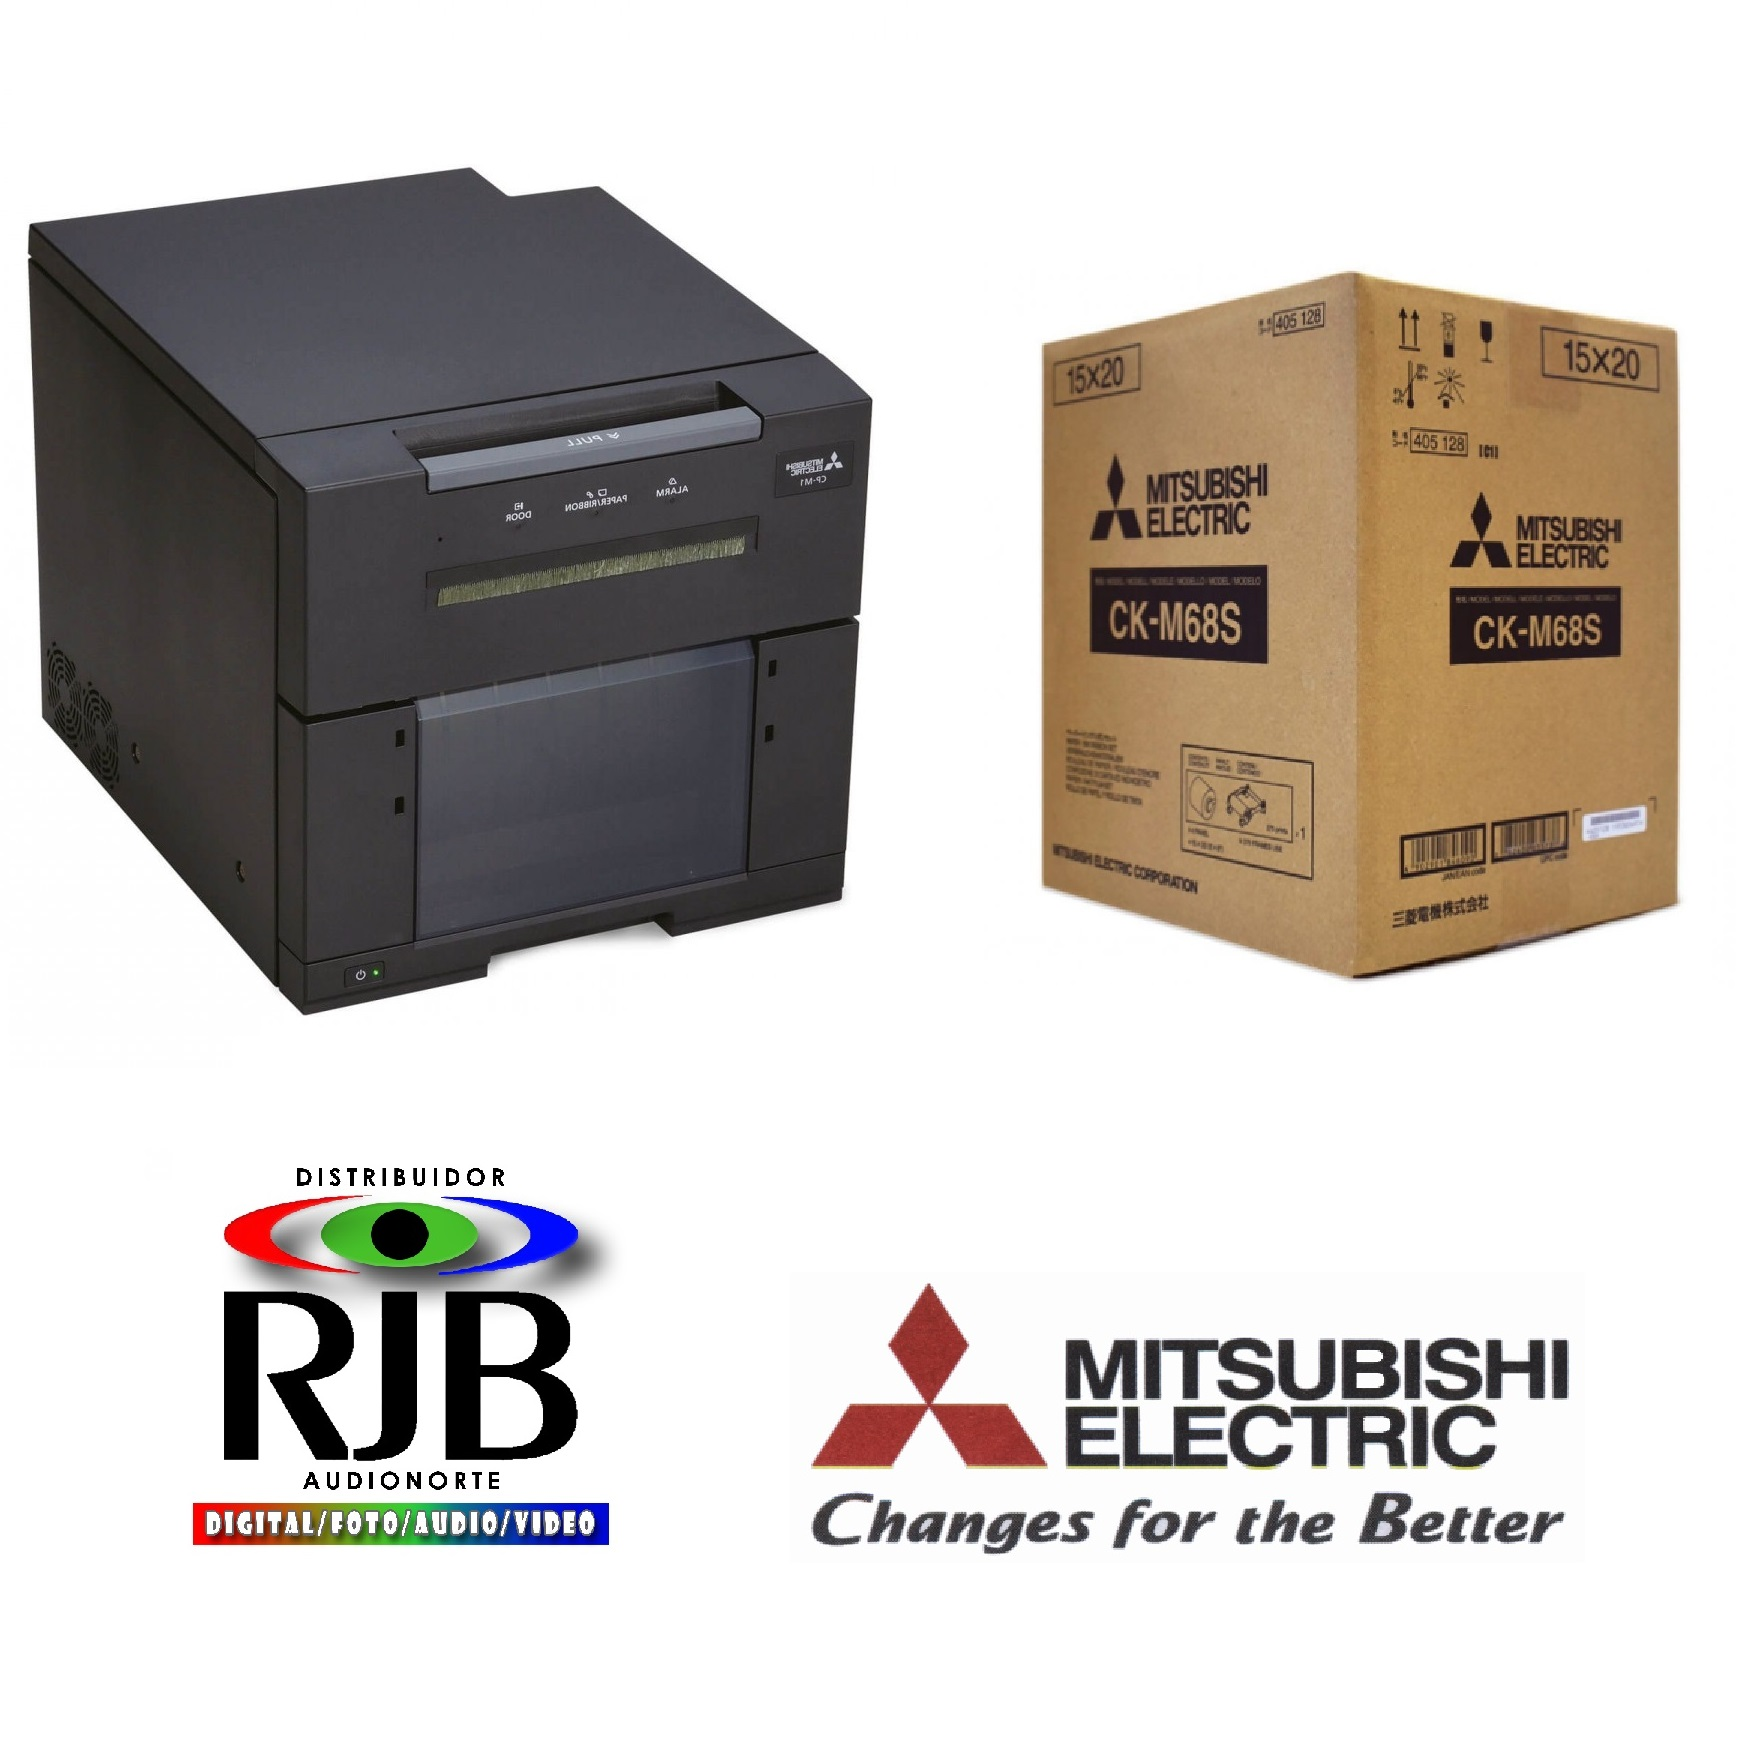 Mitsubishi-CP-M1E-CK-M68S.jpg